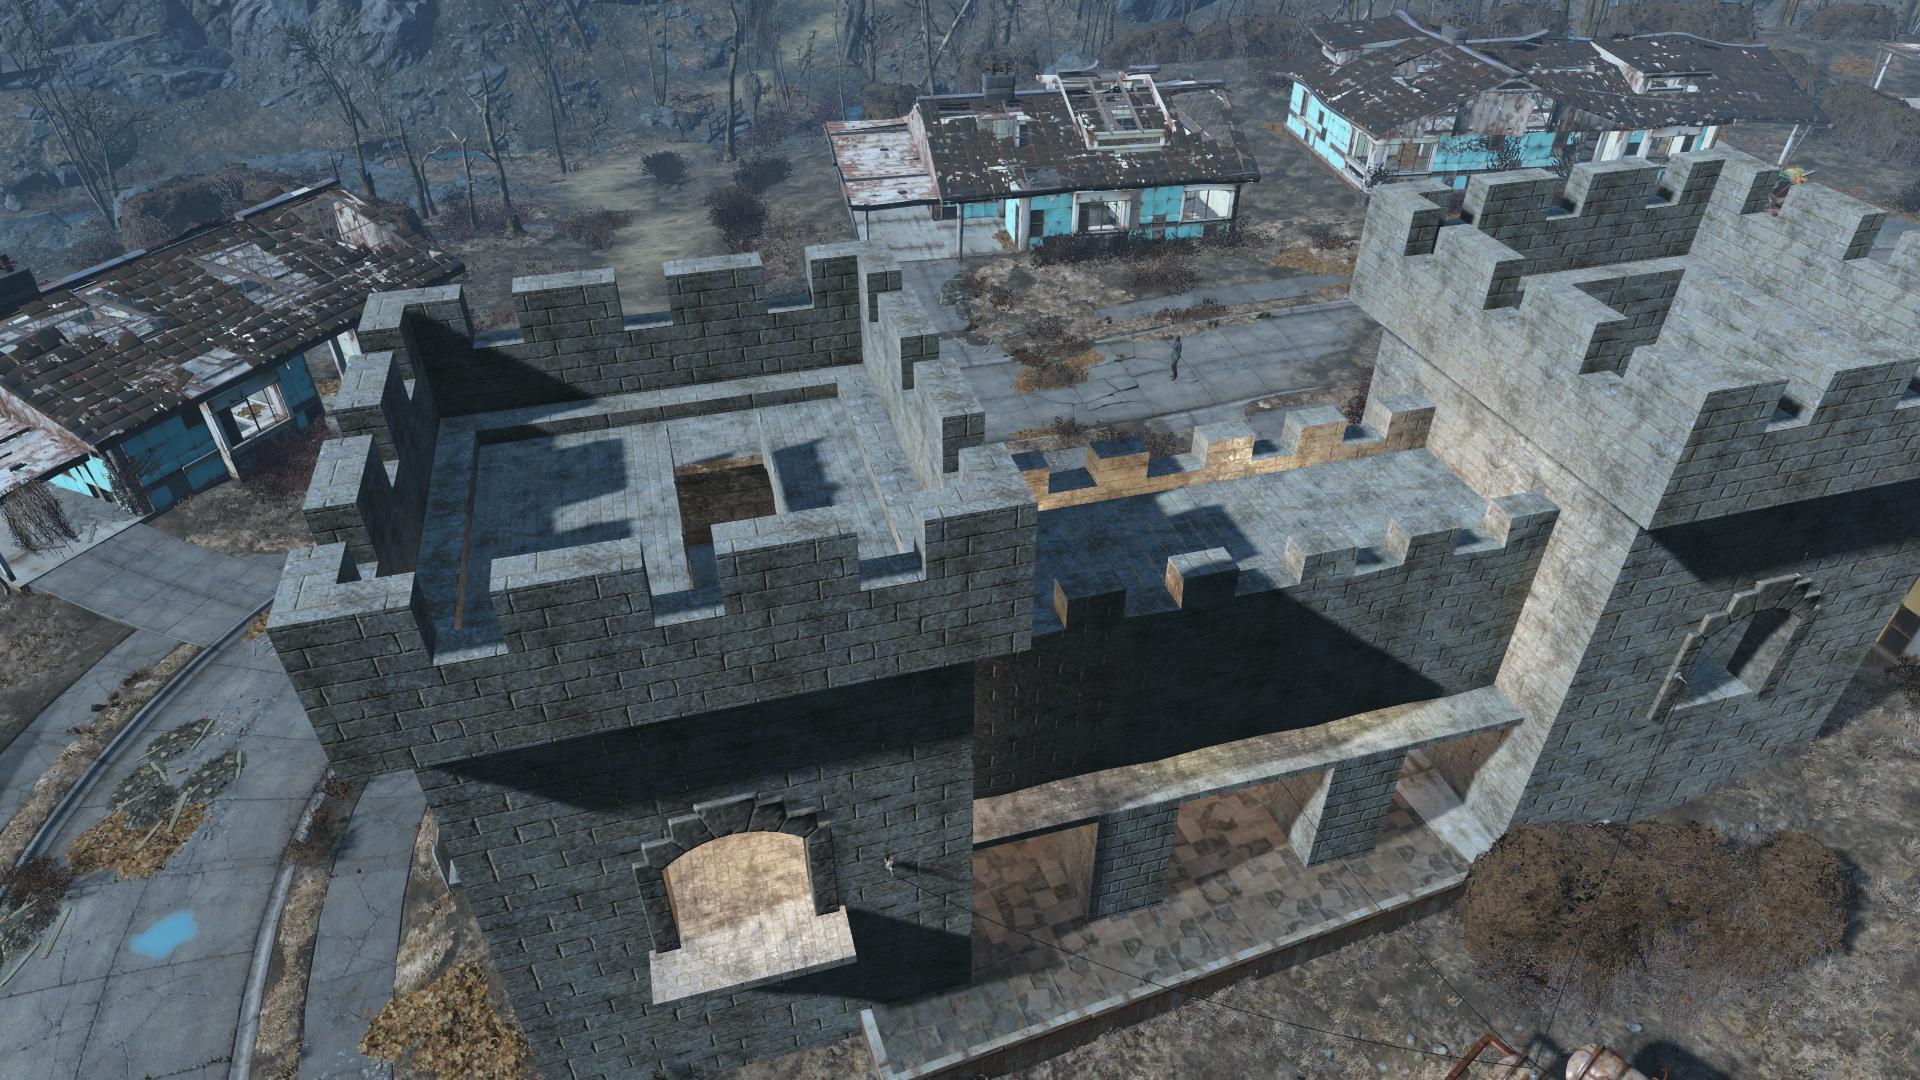 Моды на Строительство для Fallout 4